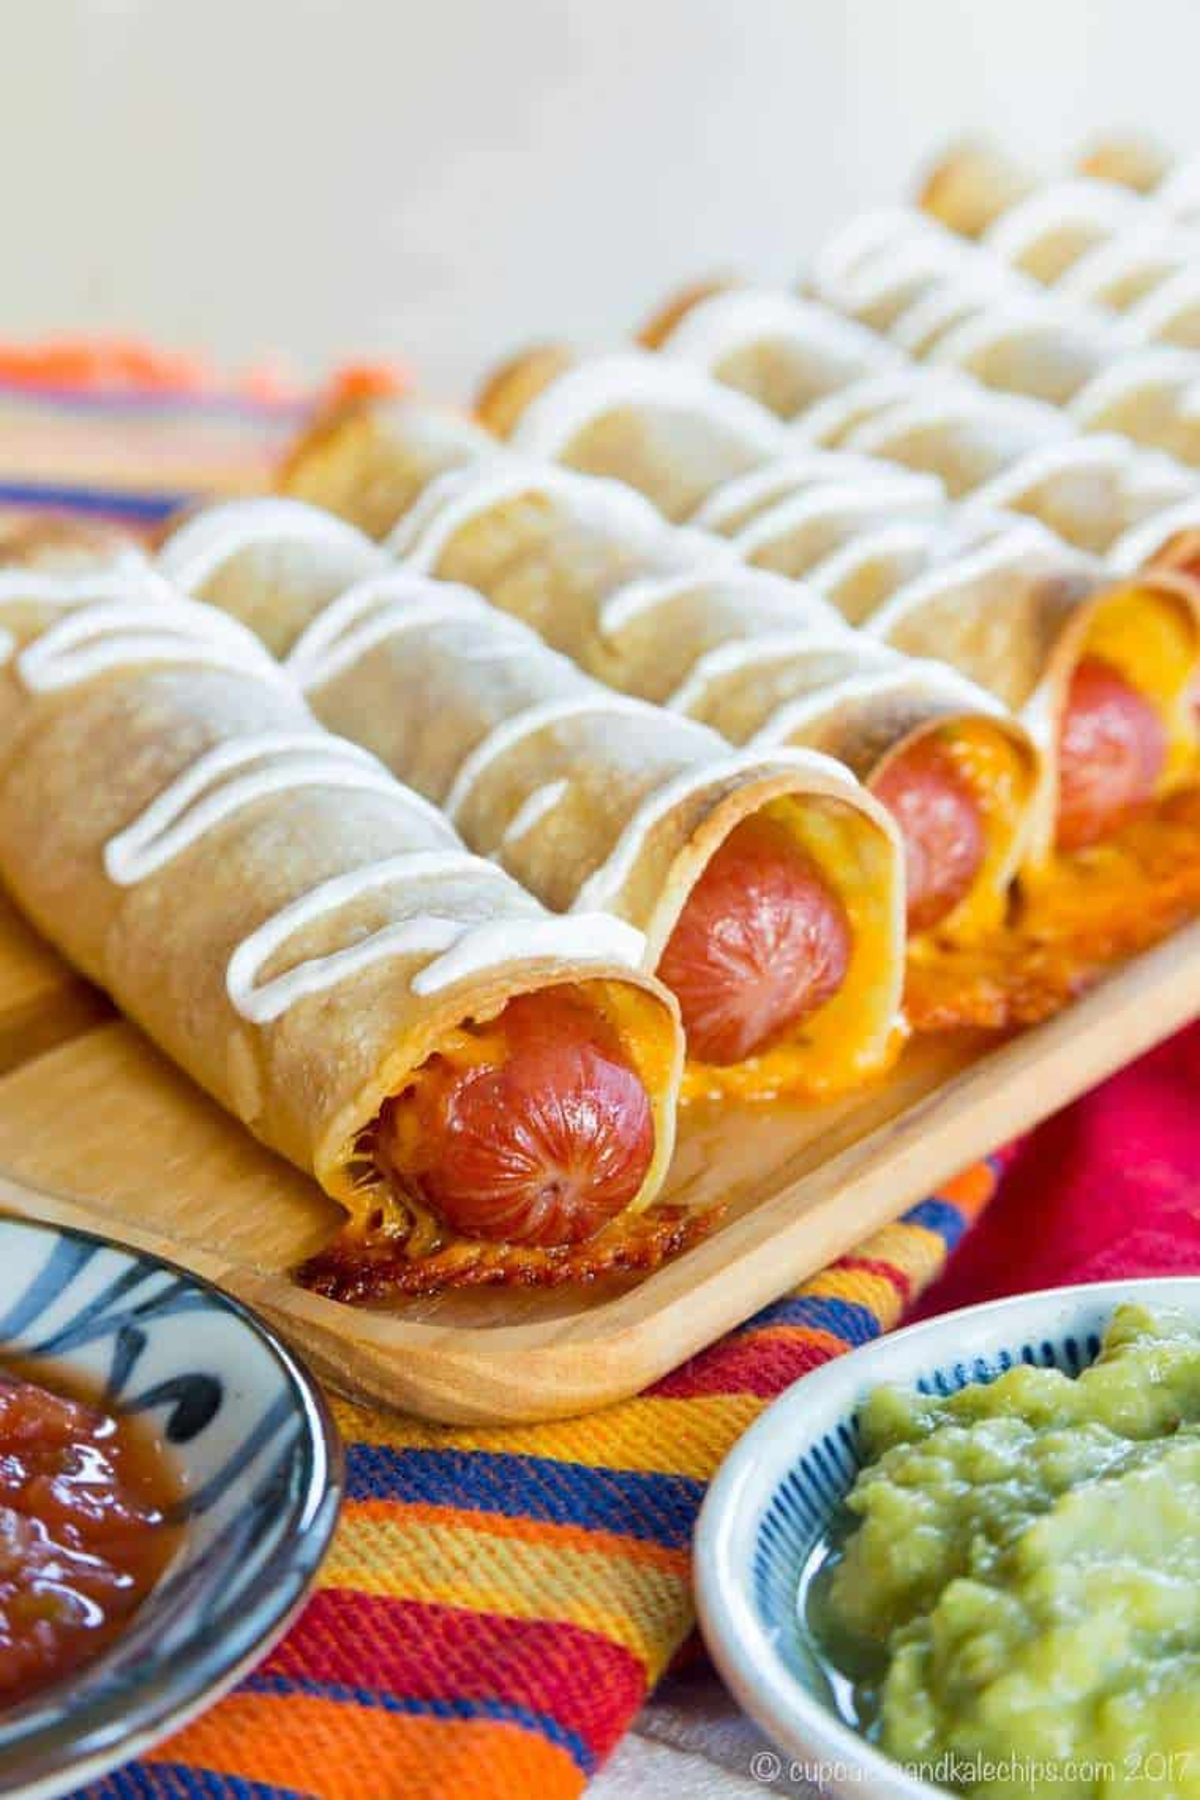 Hot Dog Baked Taquitos Recipe